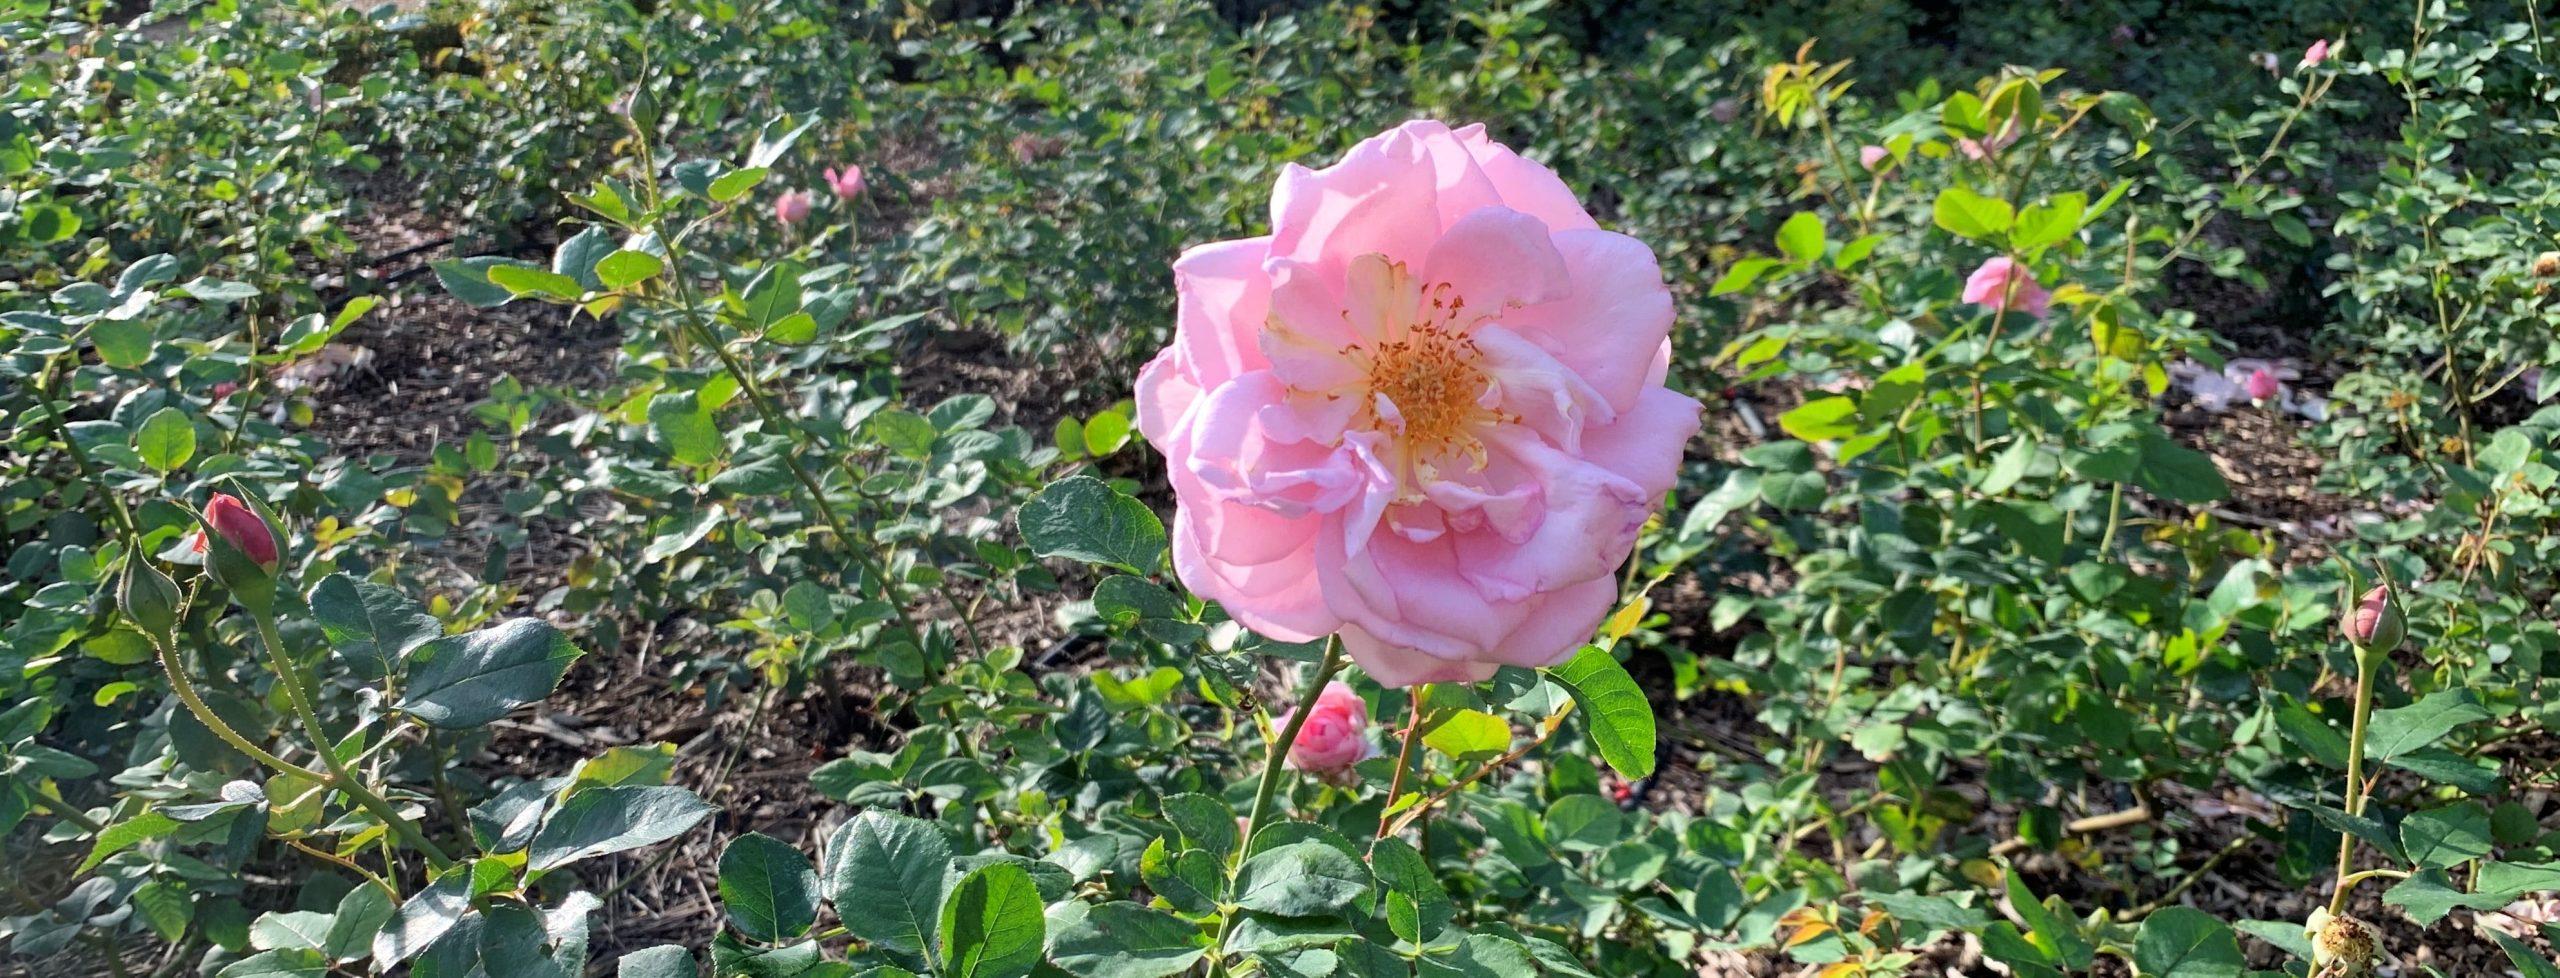 rose de fontfroide